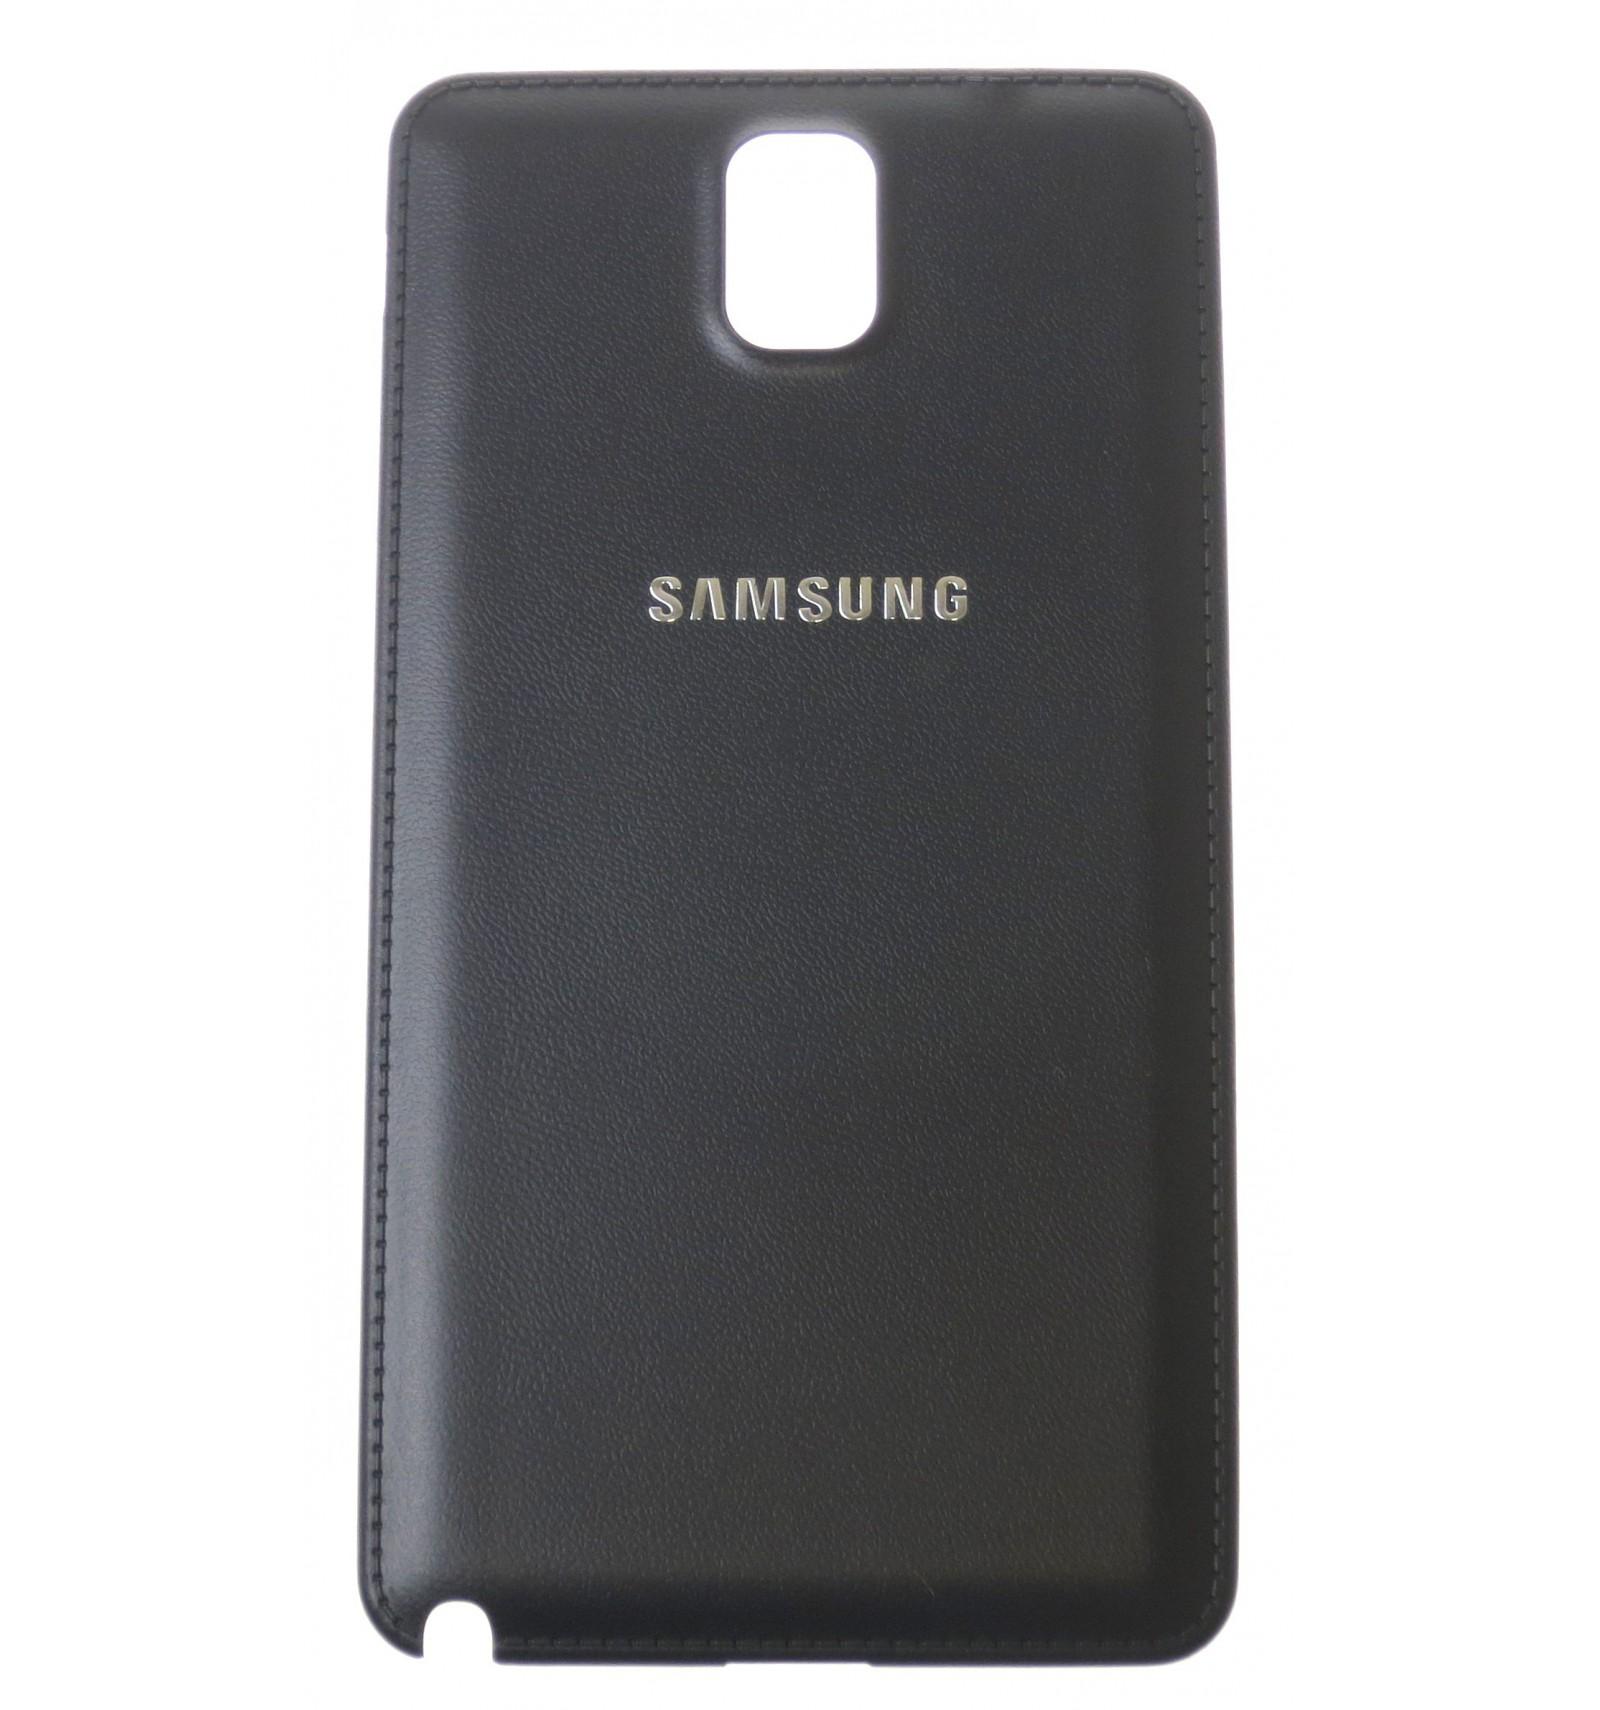 battery cover black oem for samsung galaxy note 3 n9005. Black Bedroom Furniture Sets. Home Design Ideas